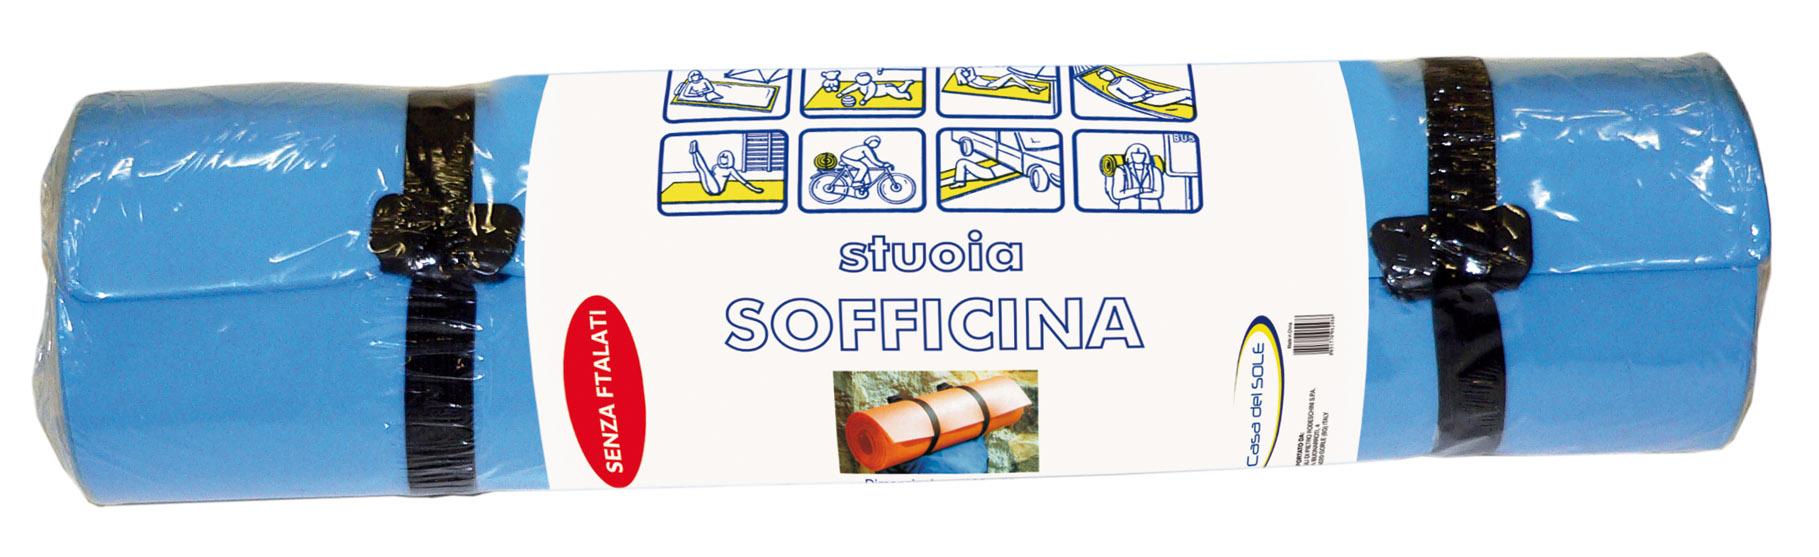 STUOIA 180X50X0 6 SOFFIC ROT